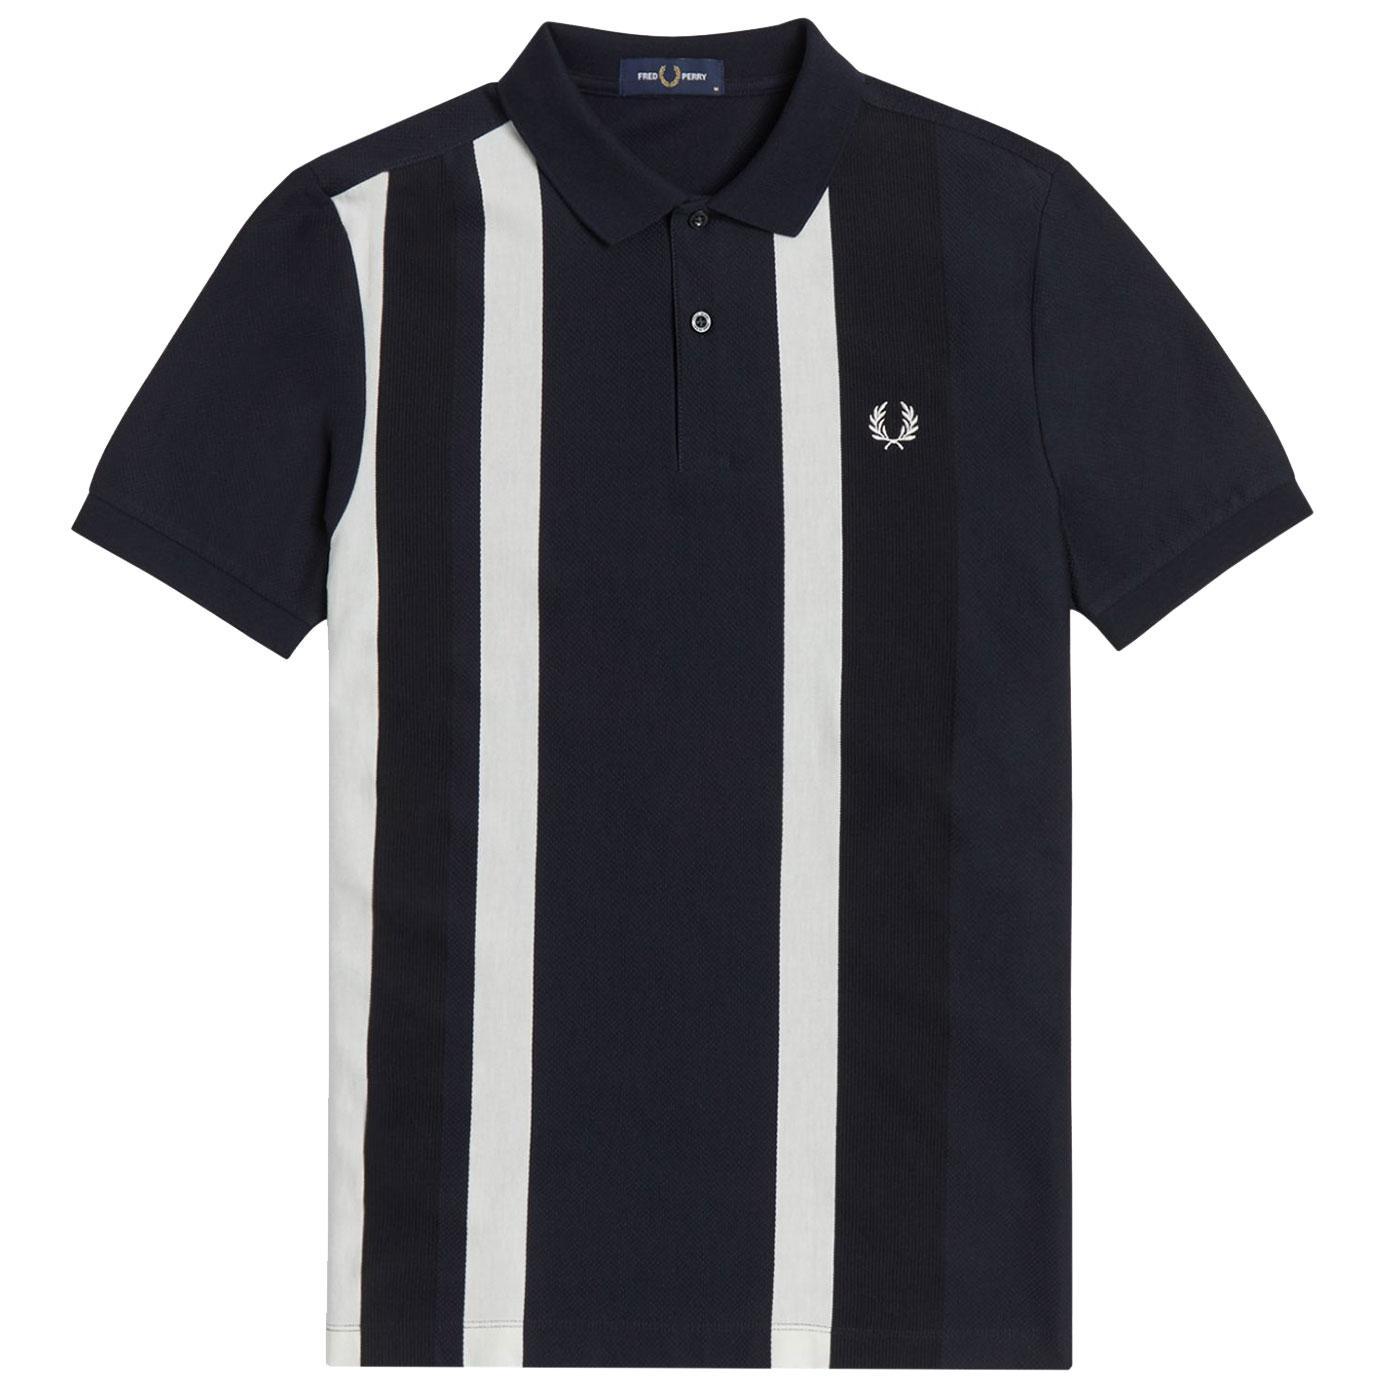 FRED PERRY Mod Textured Stripe Pique Polo Shirt N